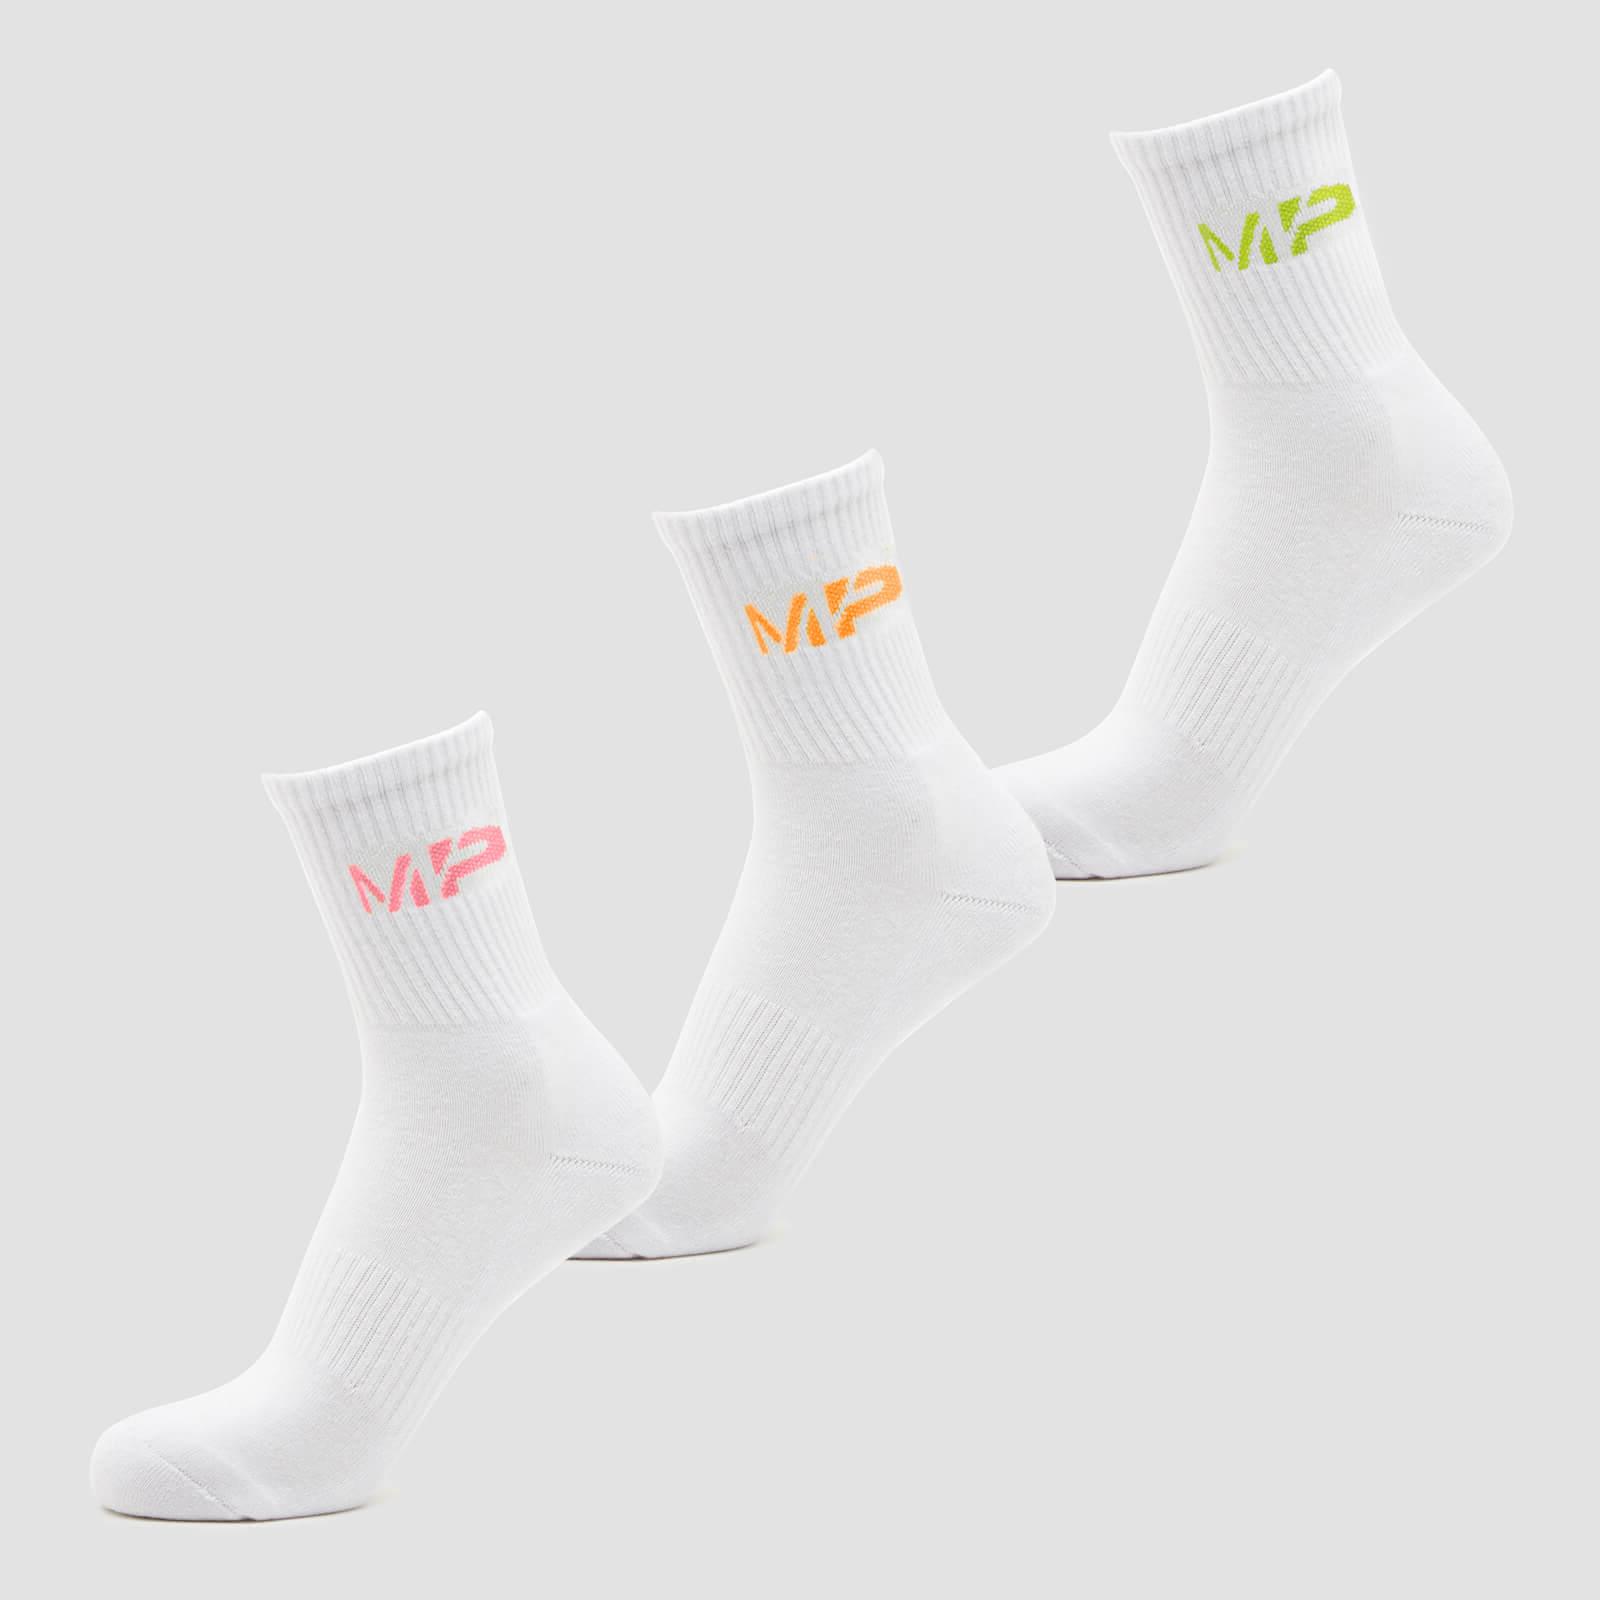 Купить MP Men's Neon MP Logo Crew Socks (3 Pack) Orange/Lime/Rose - UK 6-8, Myprotein International